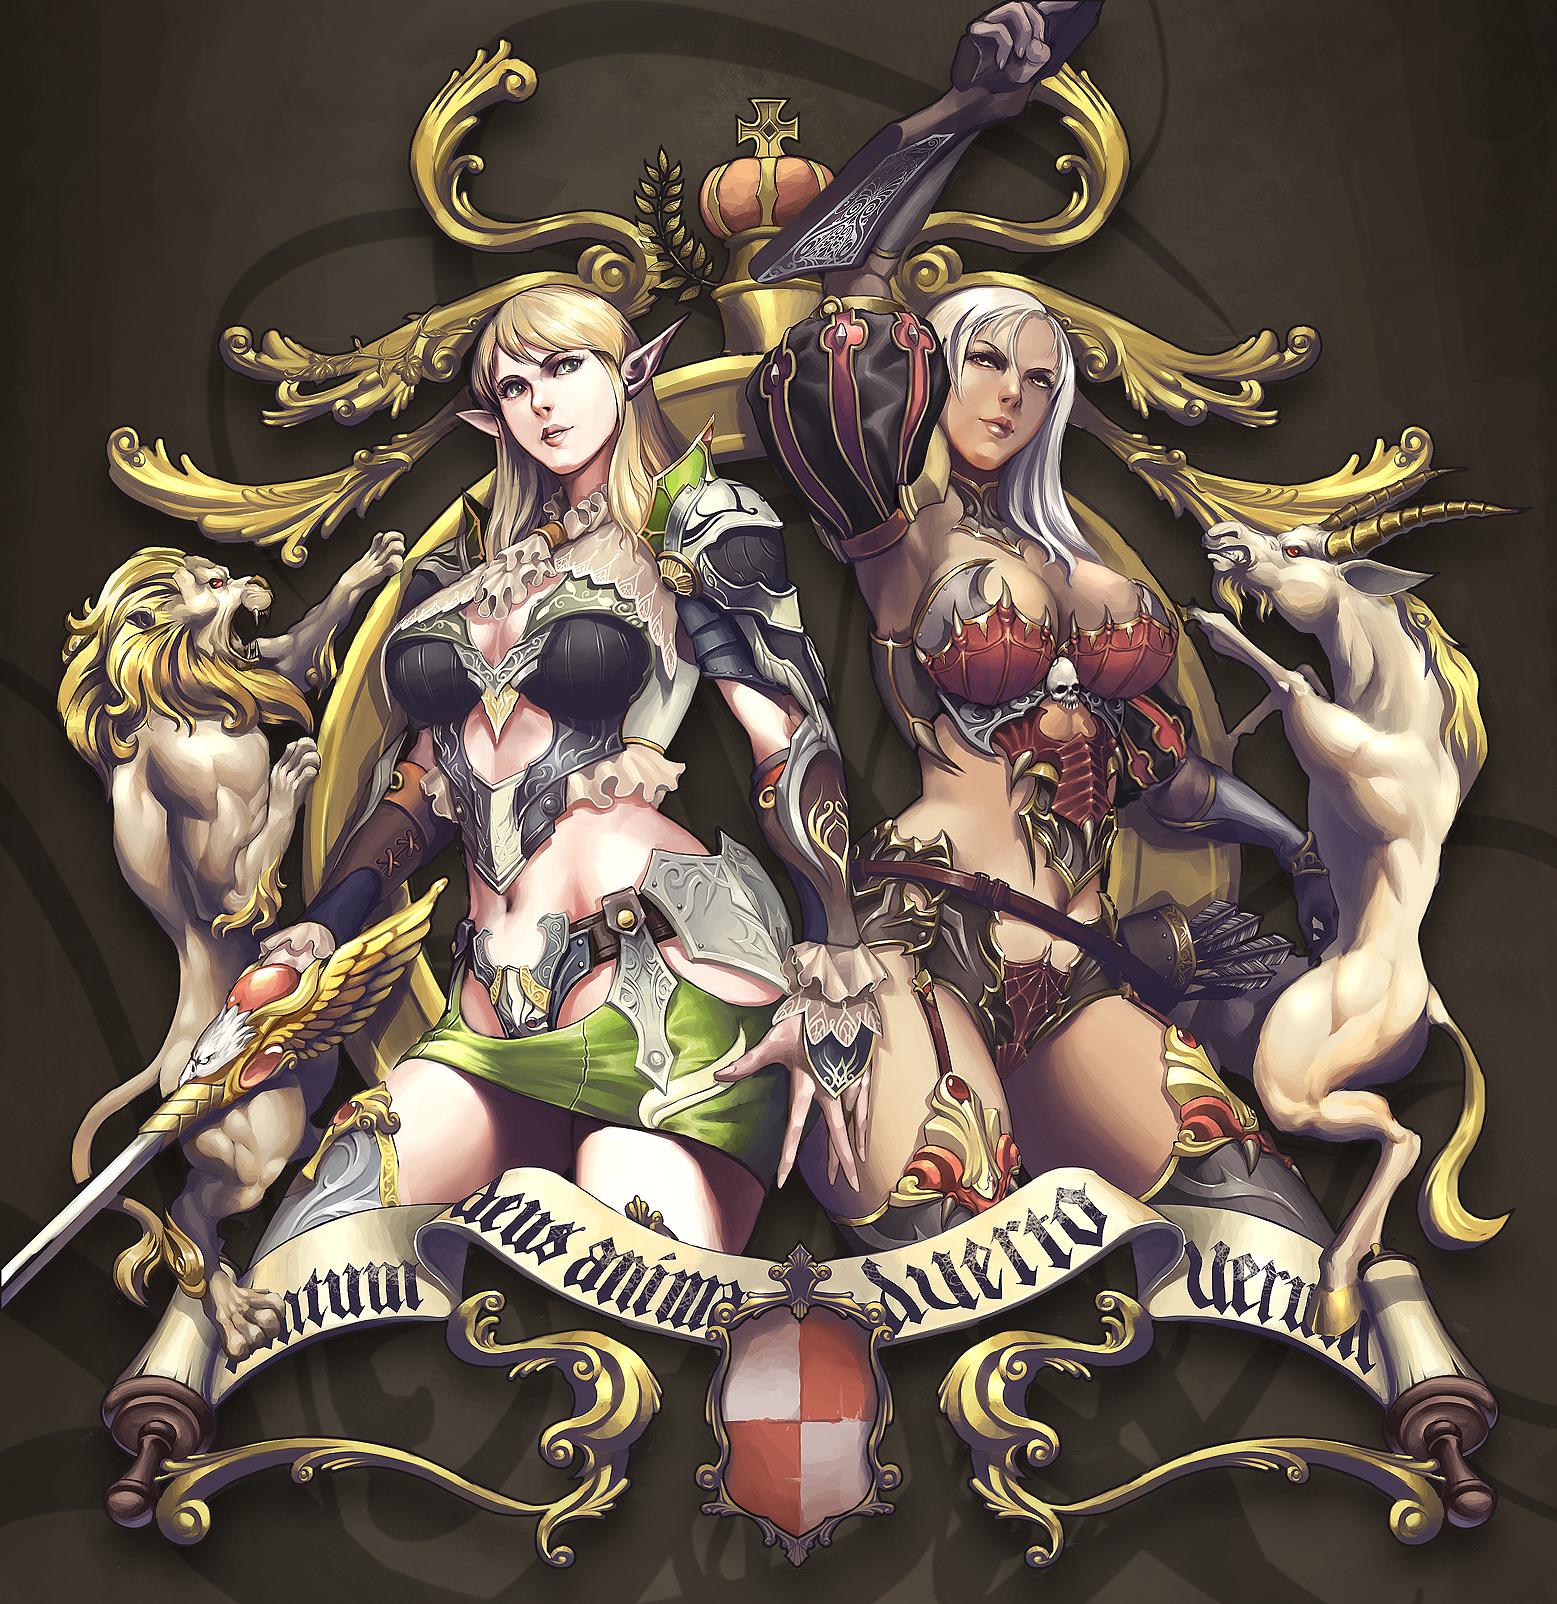 Emblem by reaper78